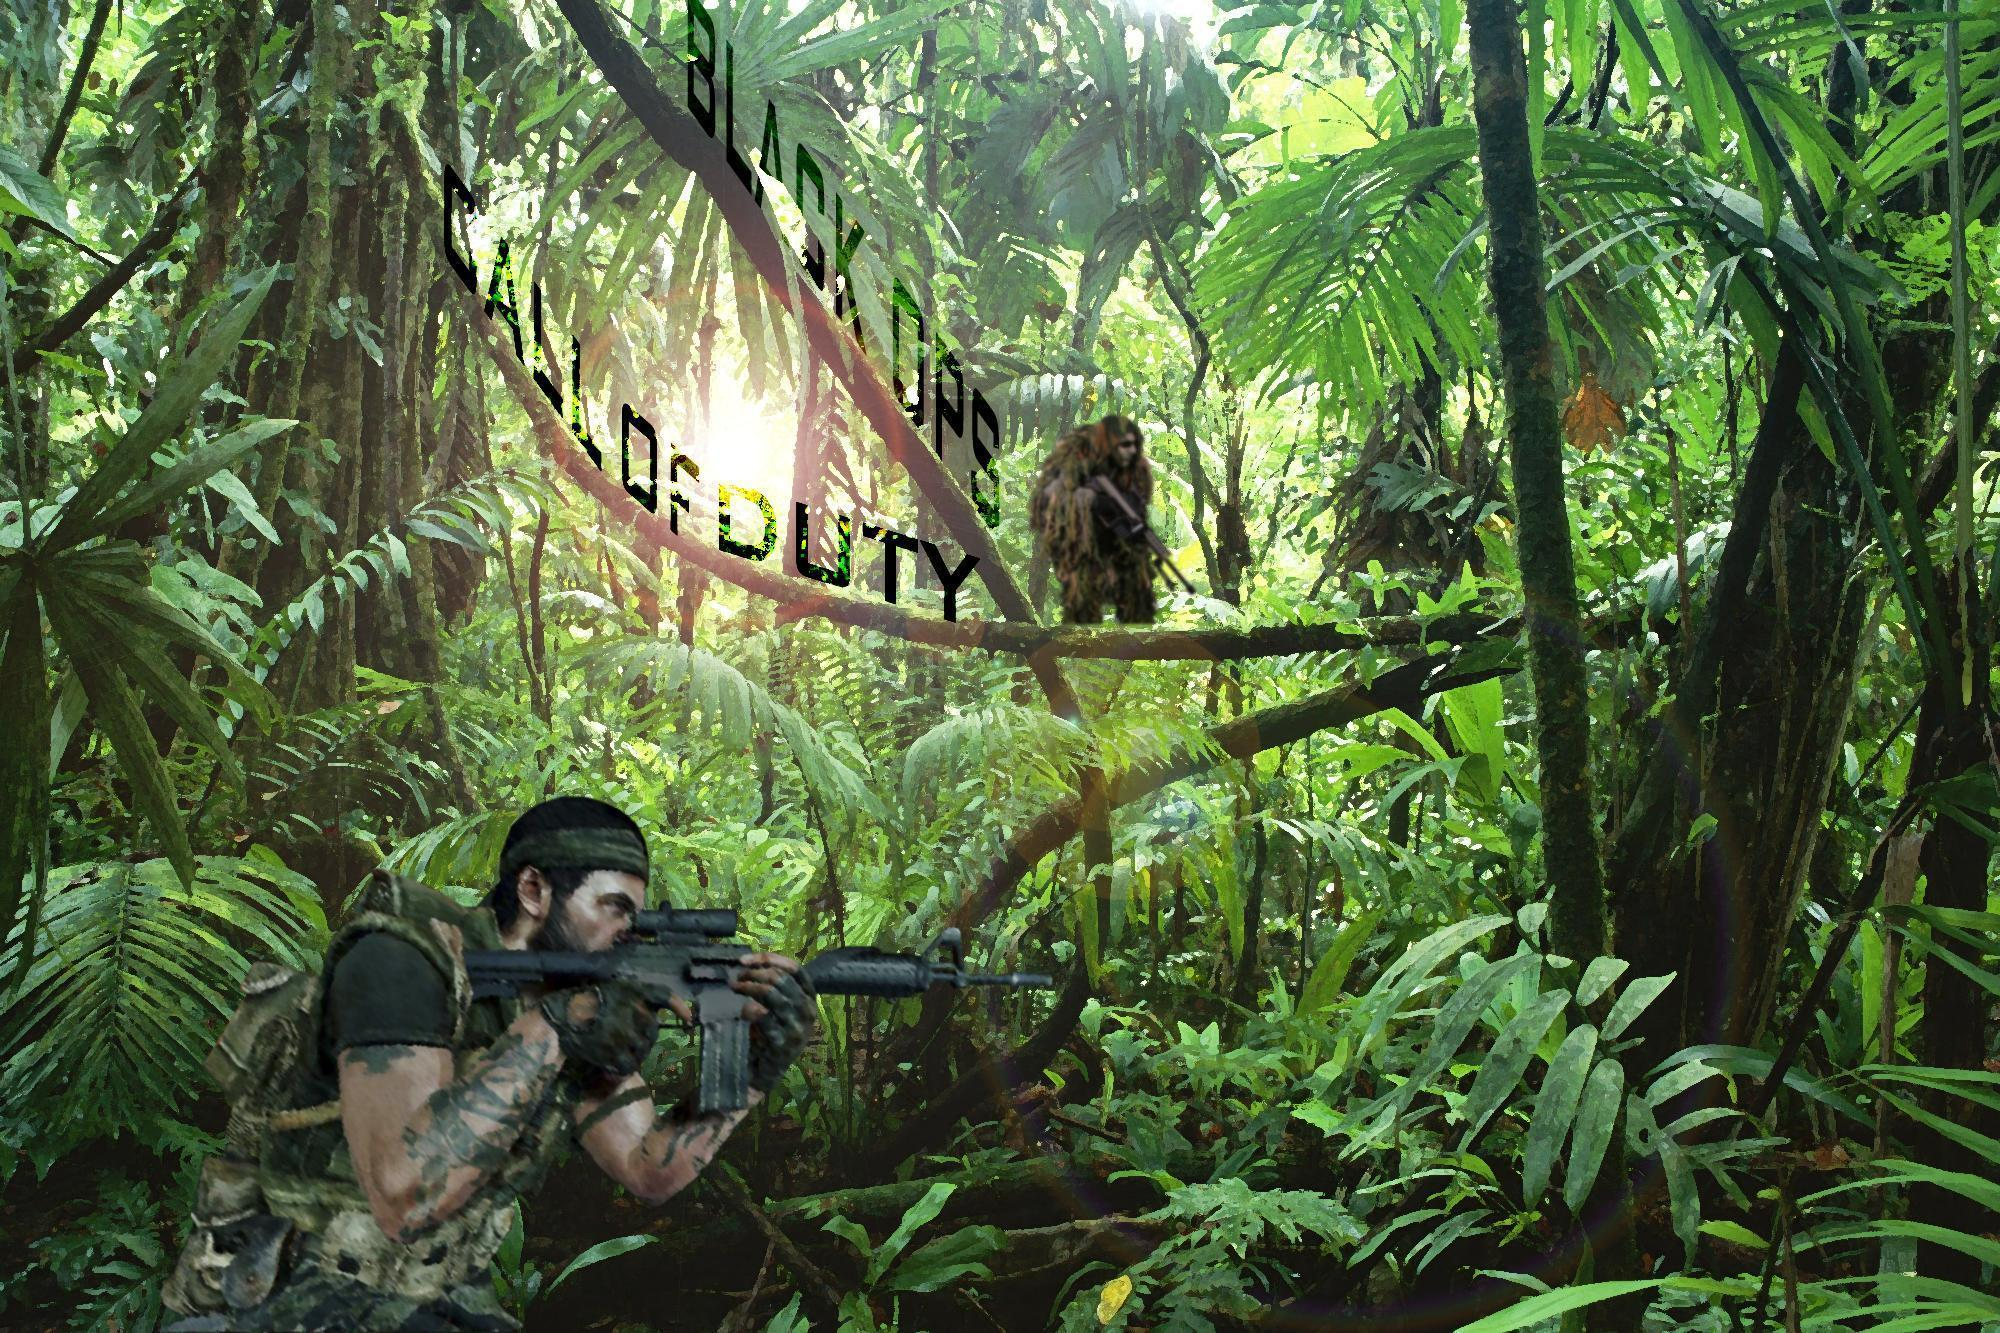 My Black Ops Wallpaper | Se7enSins Gaming Community